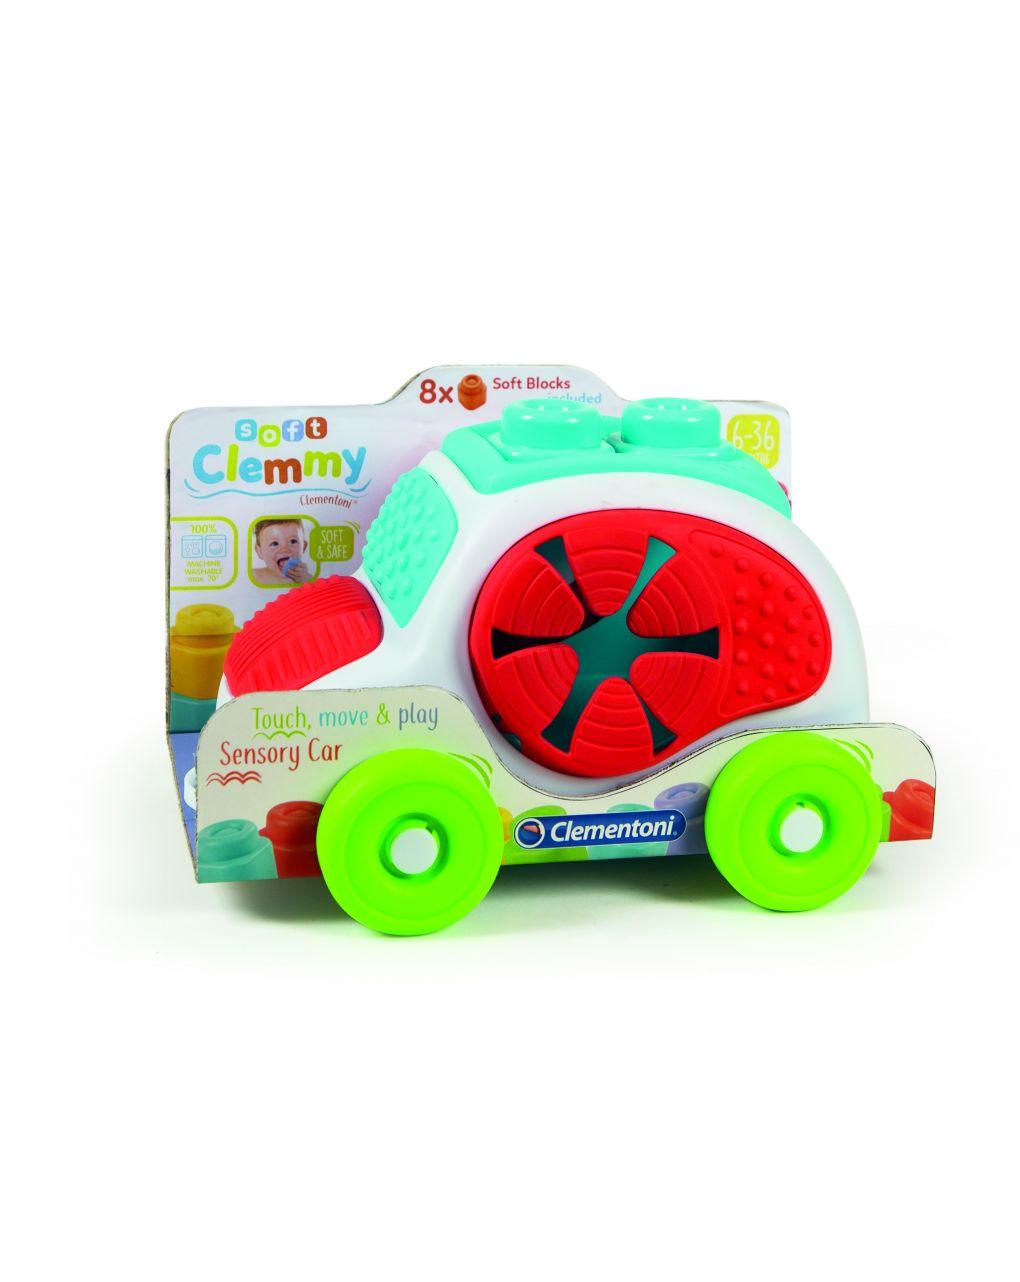 Clemmy - tocca, scopri e guida macchinina sensoriale - Clementoni